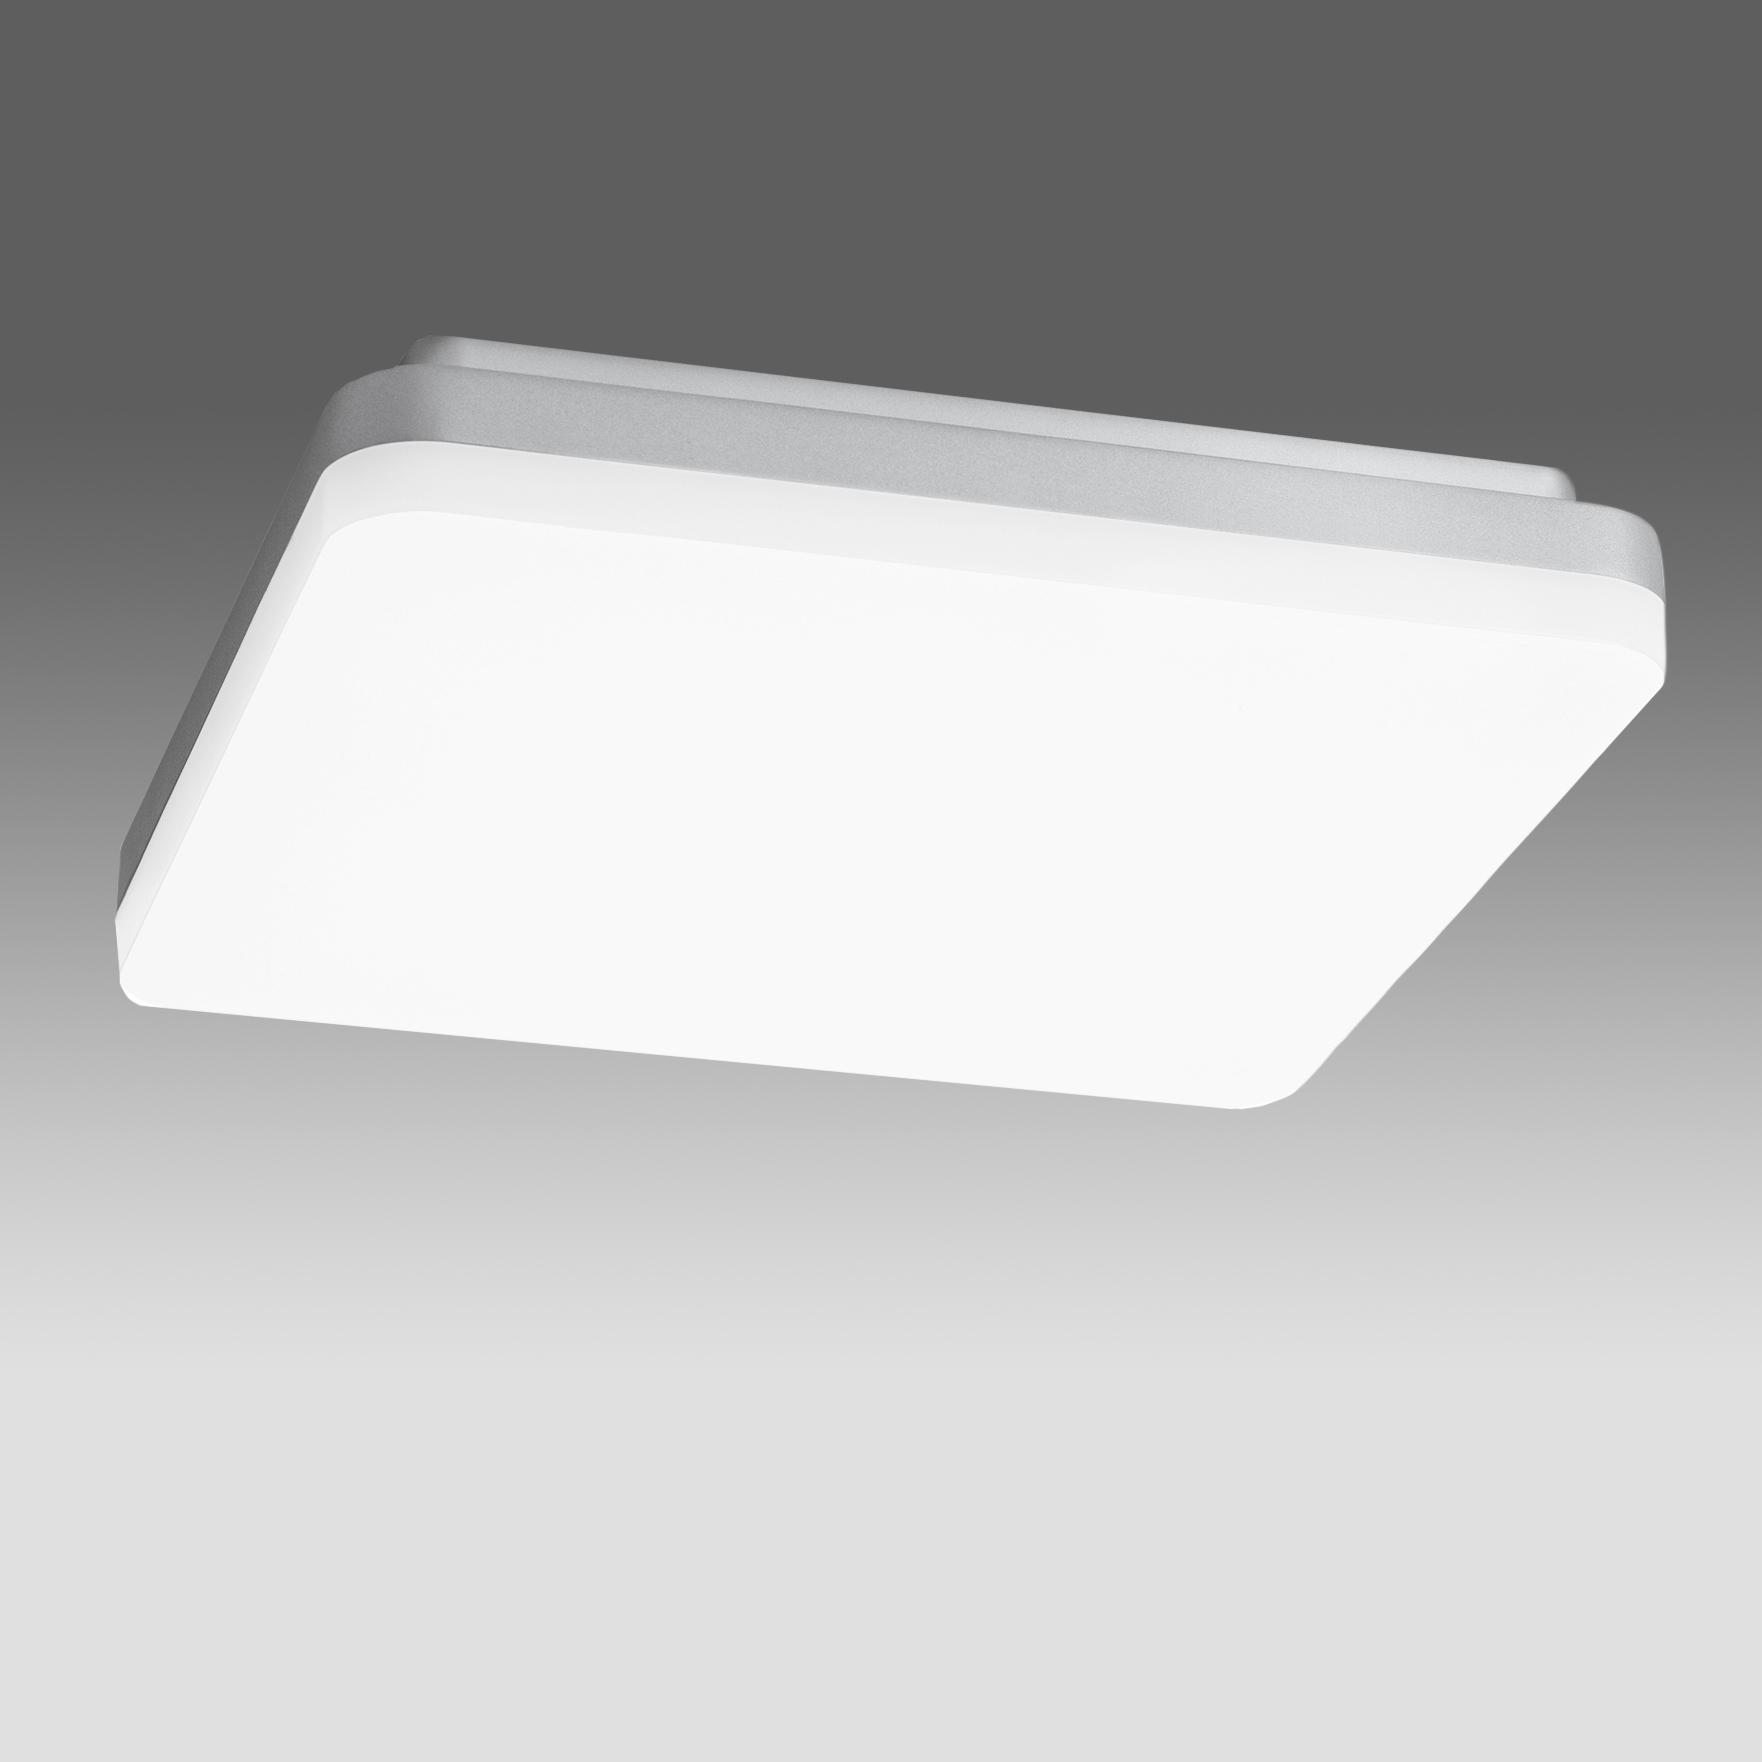 1 Stk Elegance Square III 27W 2800lm 3000K Sensor IP20 silber LILE0042--